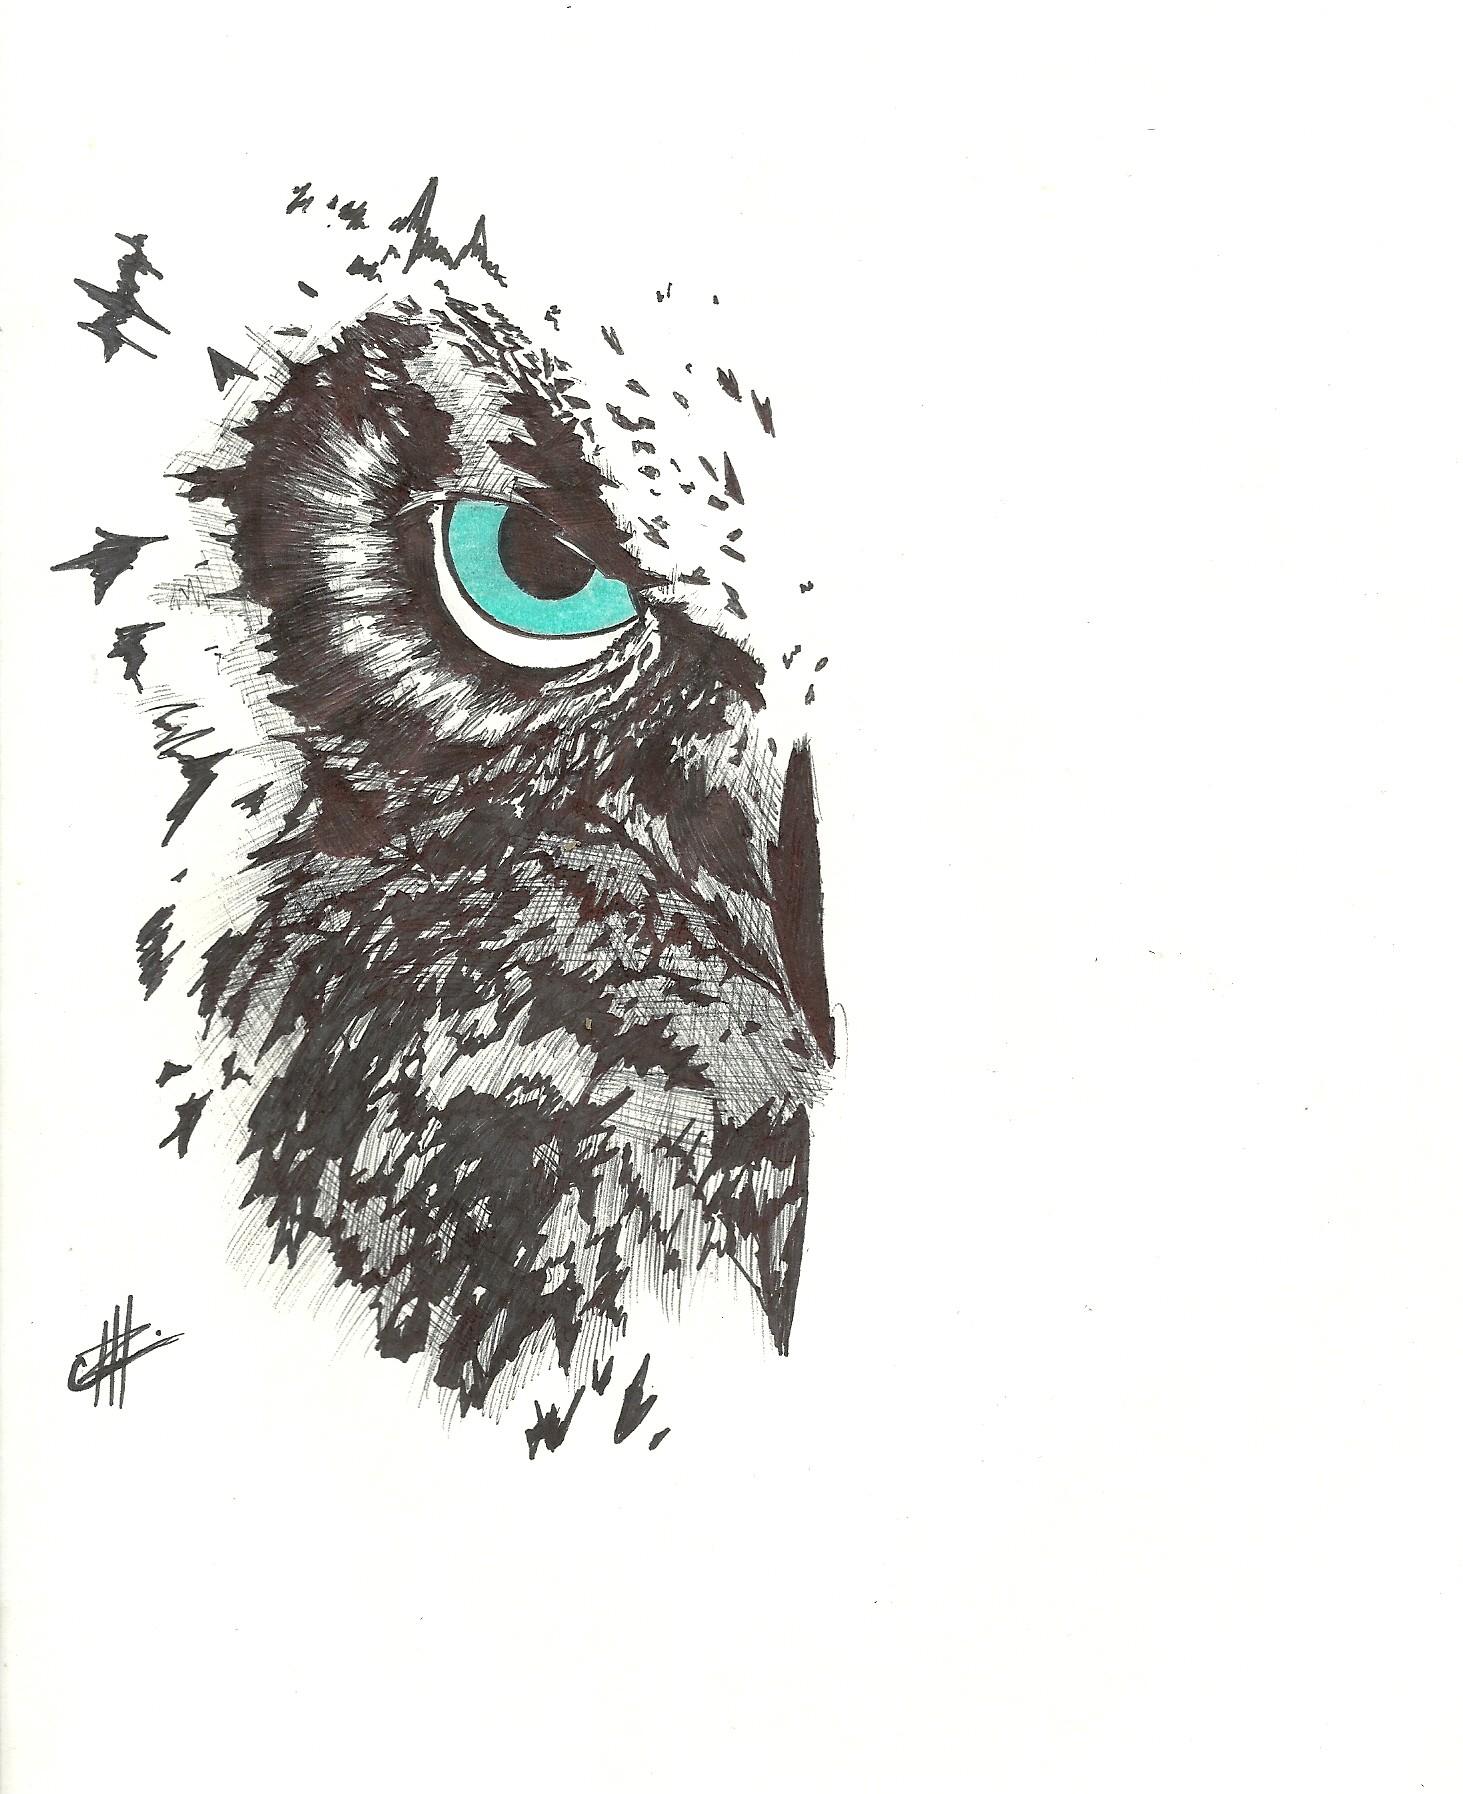 ArtStation - Owl Tattoo Idea, Christian Yégües